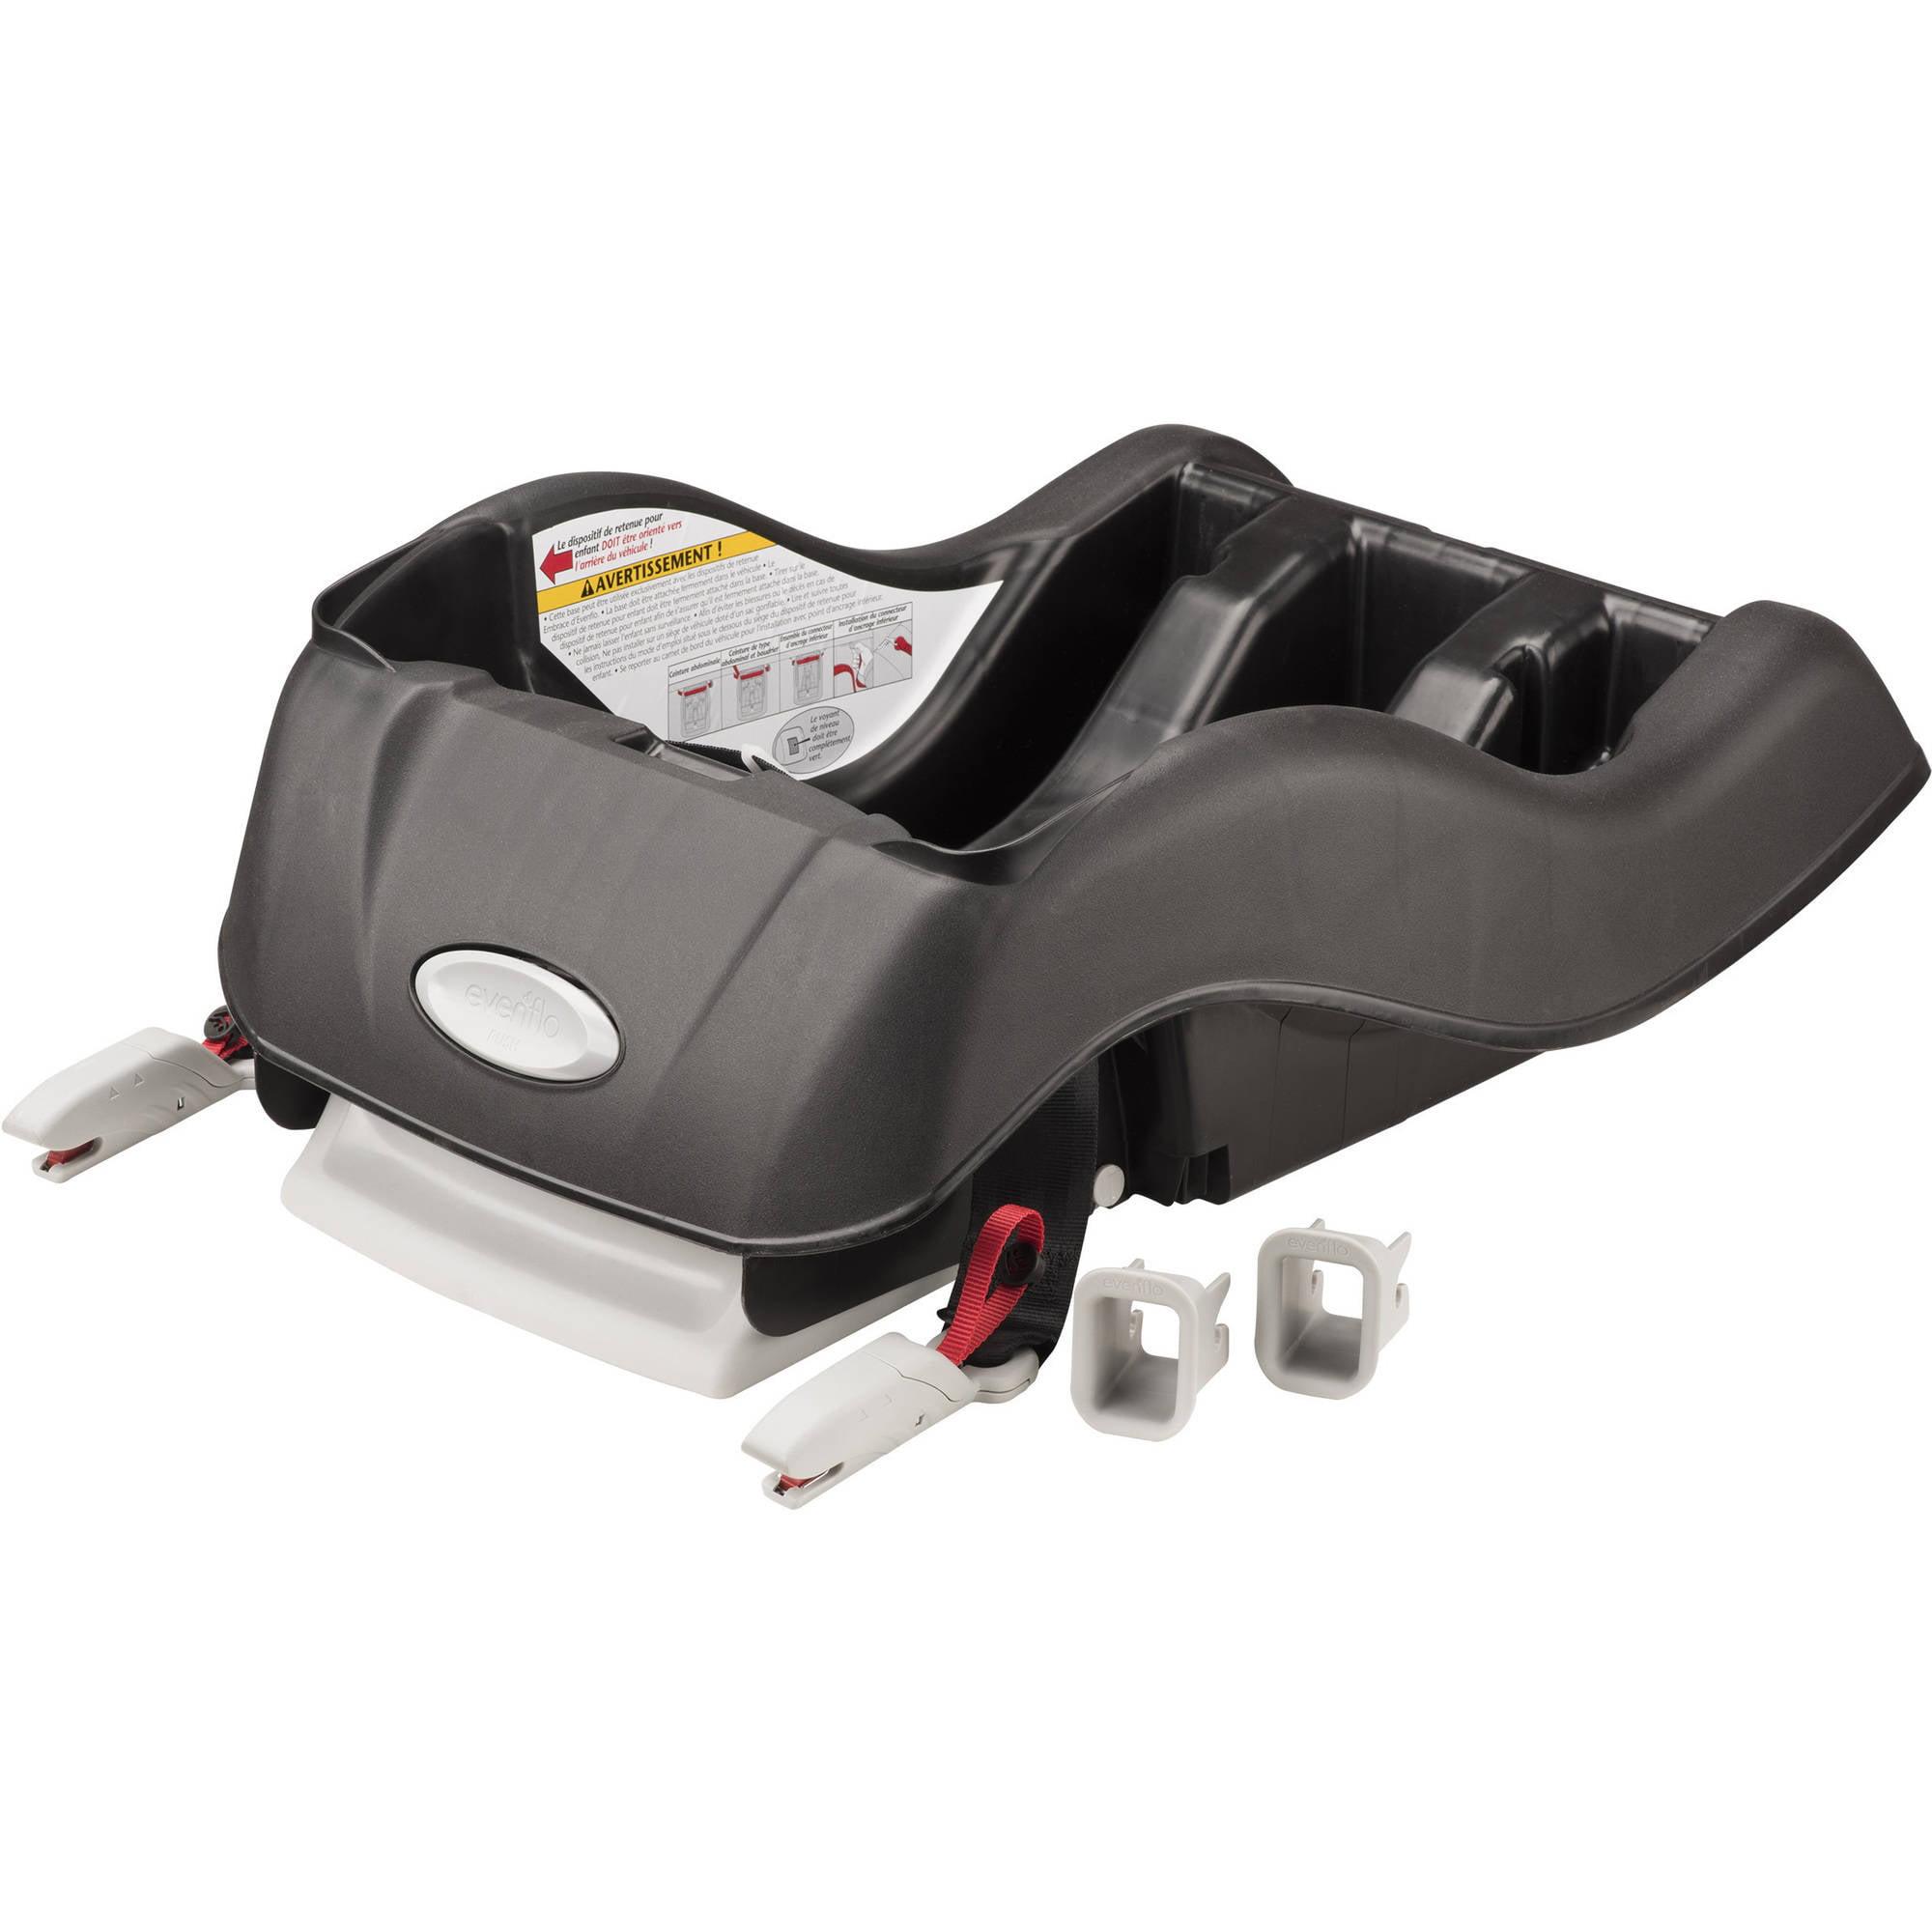 Evenflo Embrace Infant Car Seat Base with Suresafe